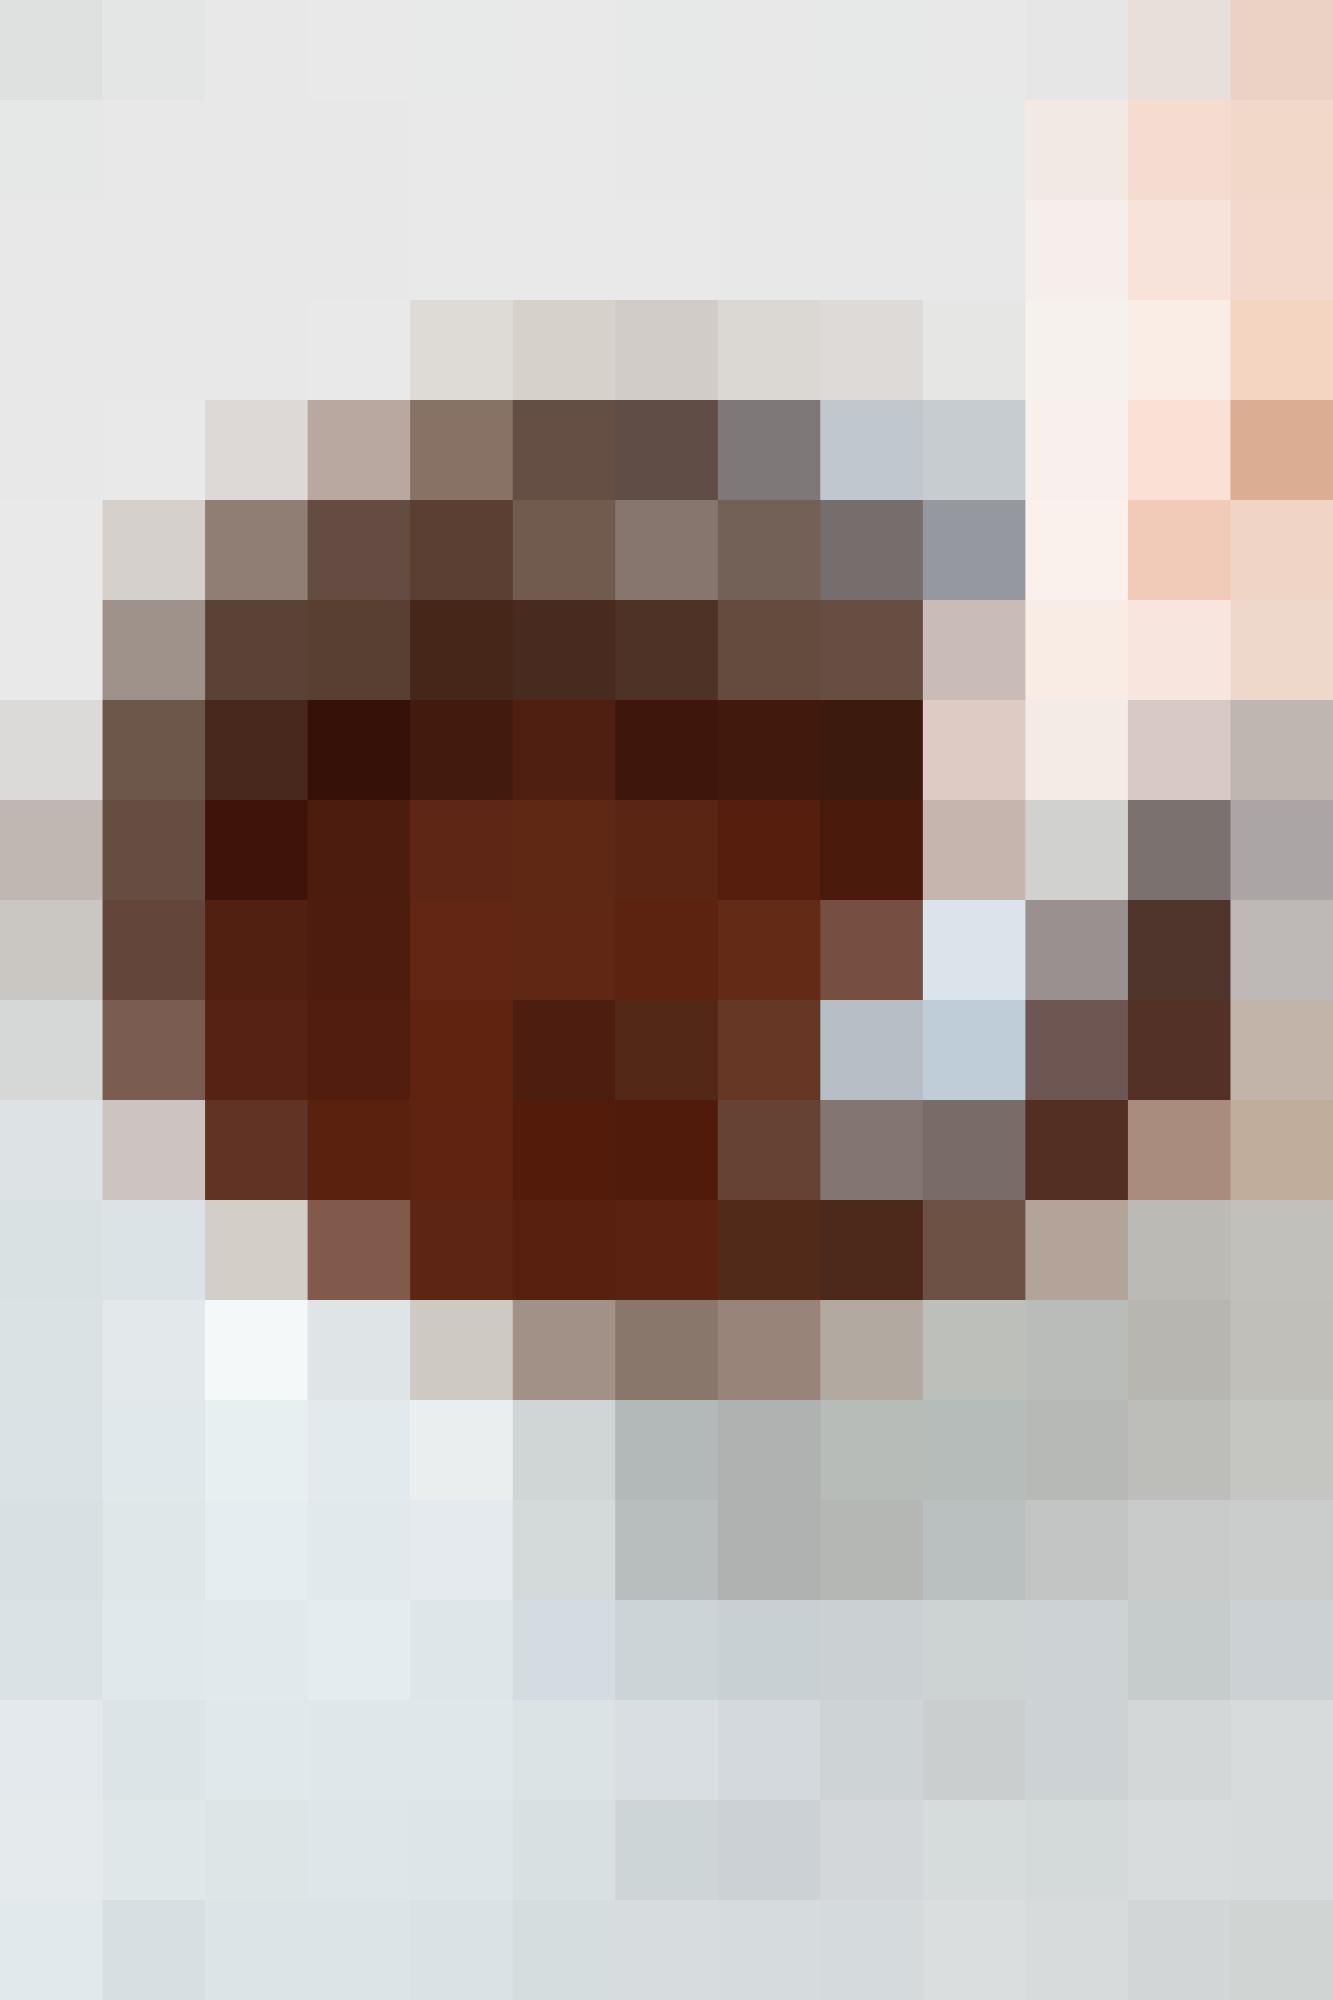 How To Make Chocolate Sheet Cake: gallery image 7